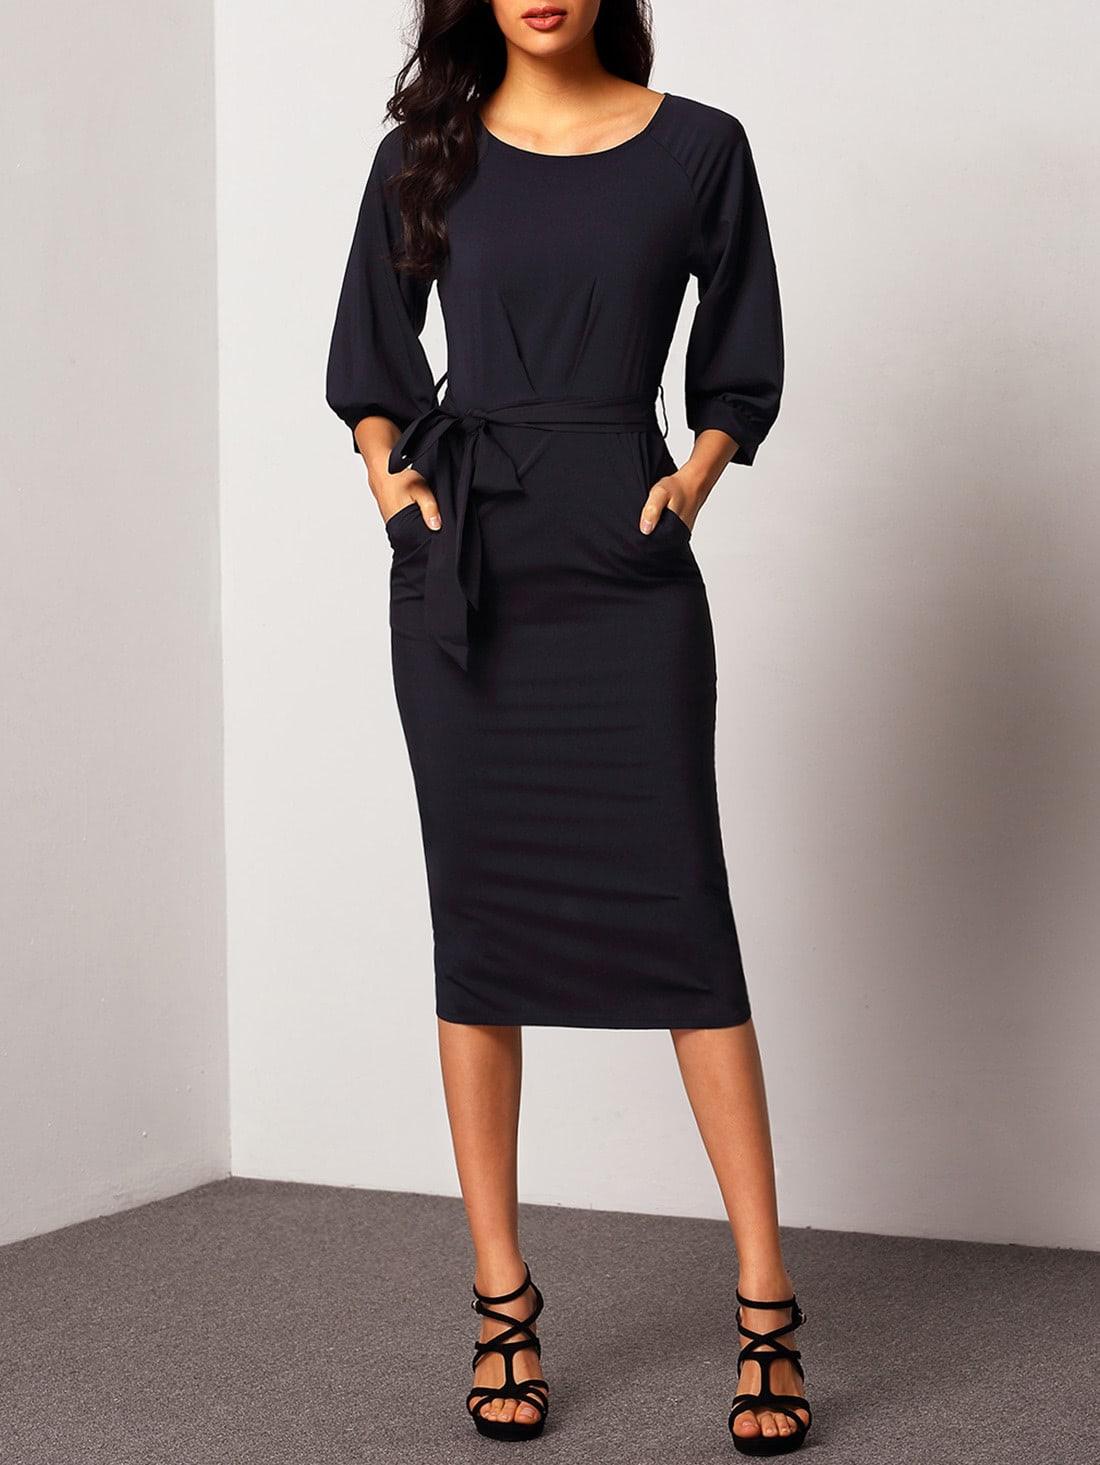 Puff Sleeve Belt Chiffon Slim Dress RDRE150928313